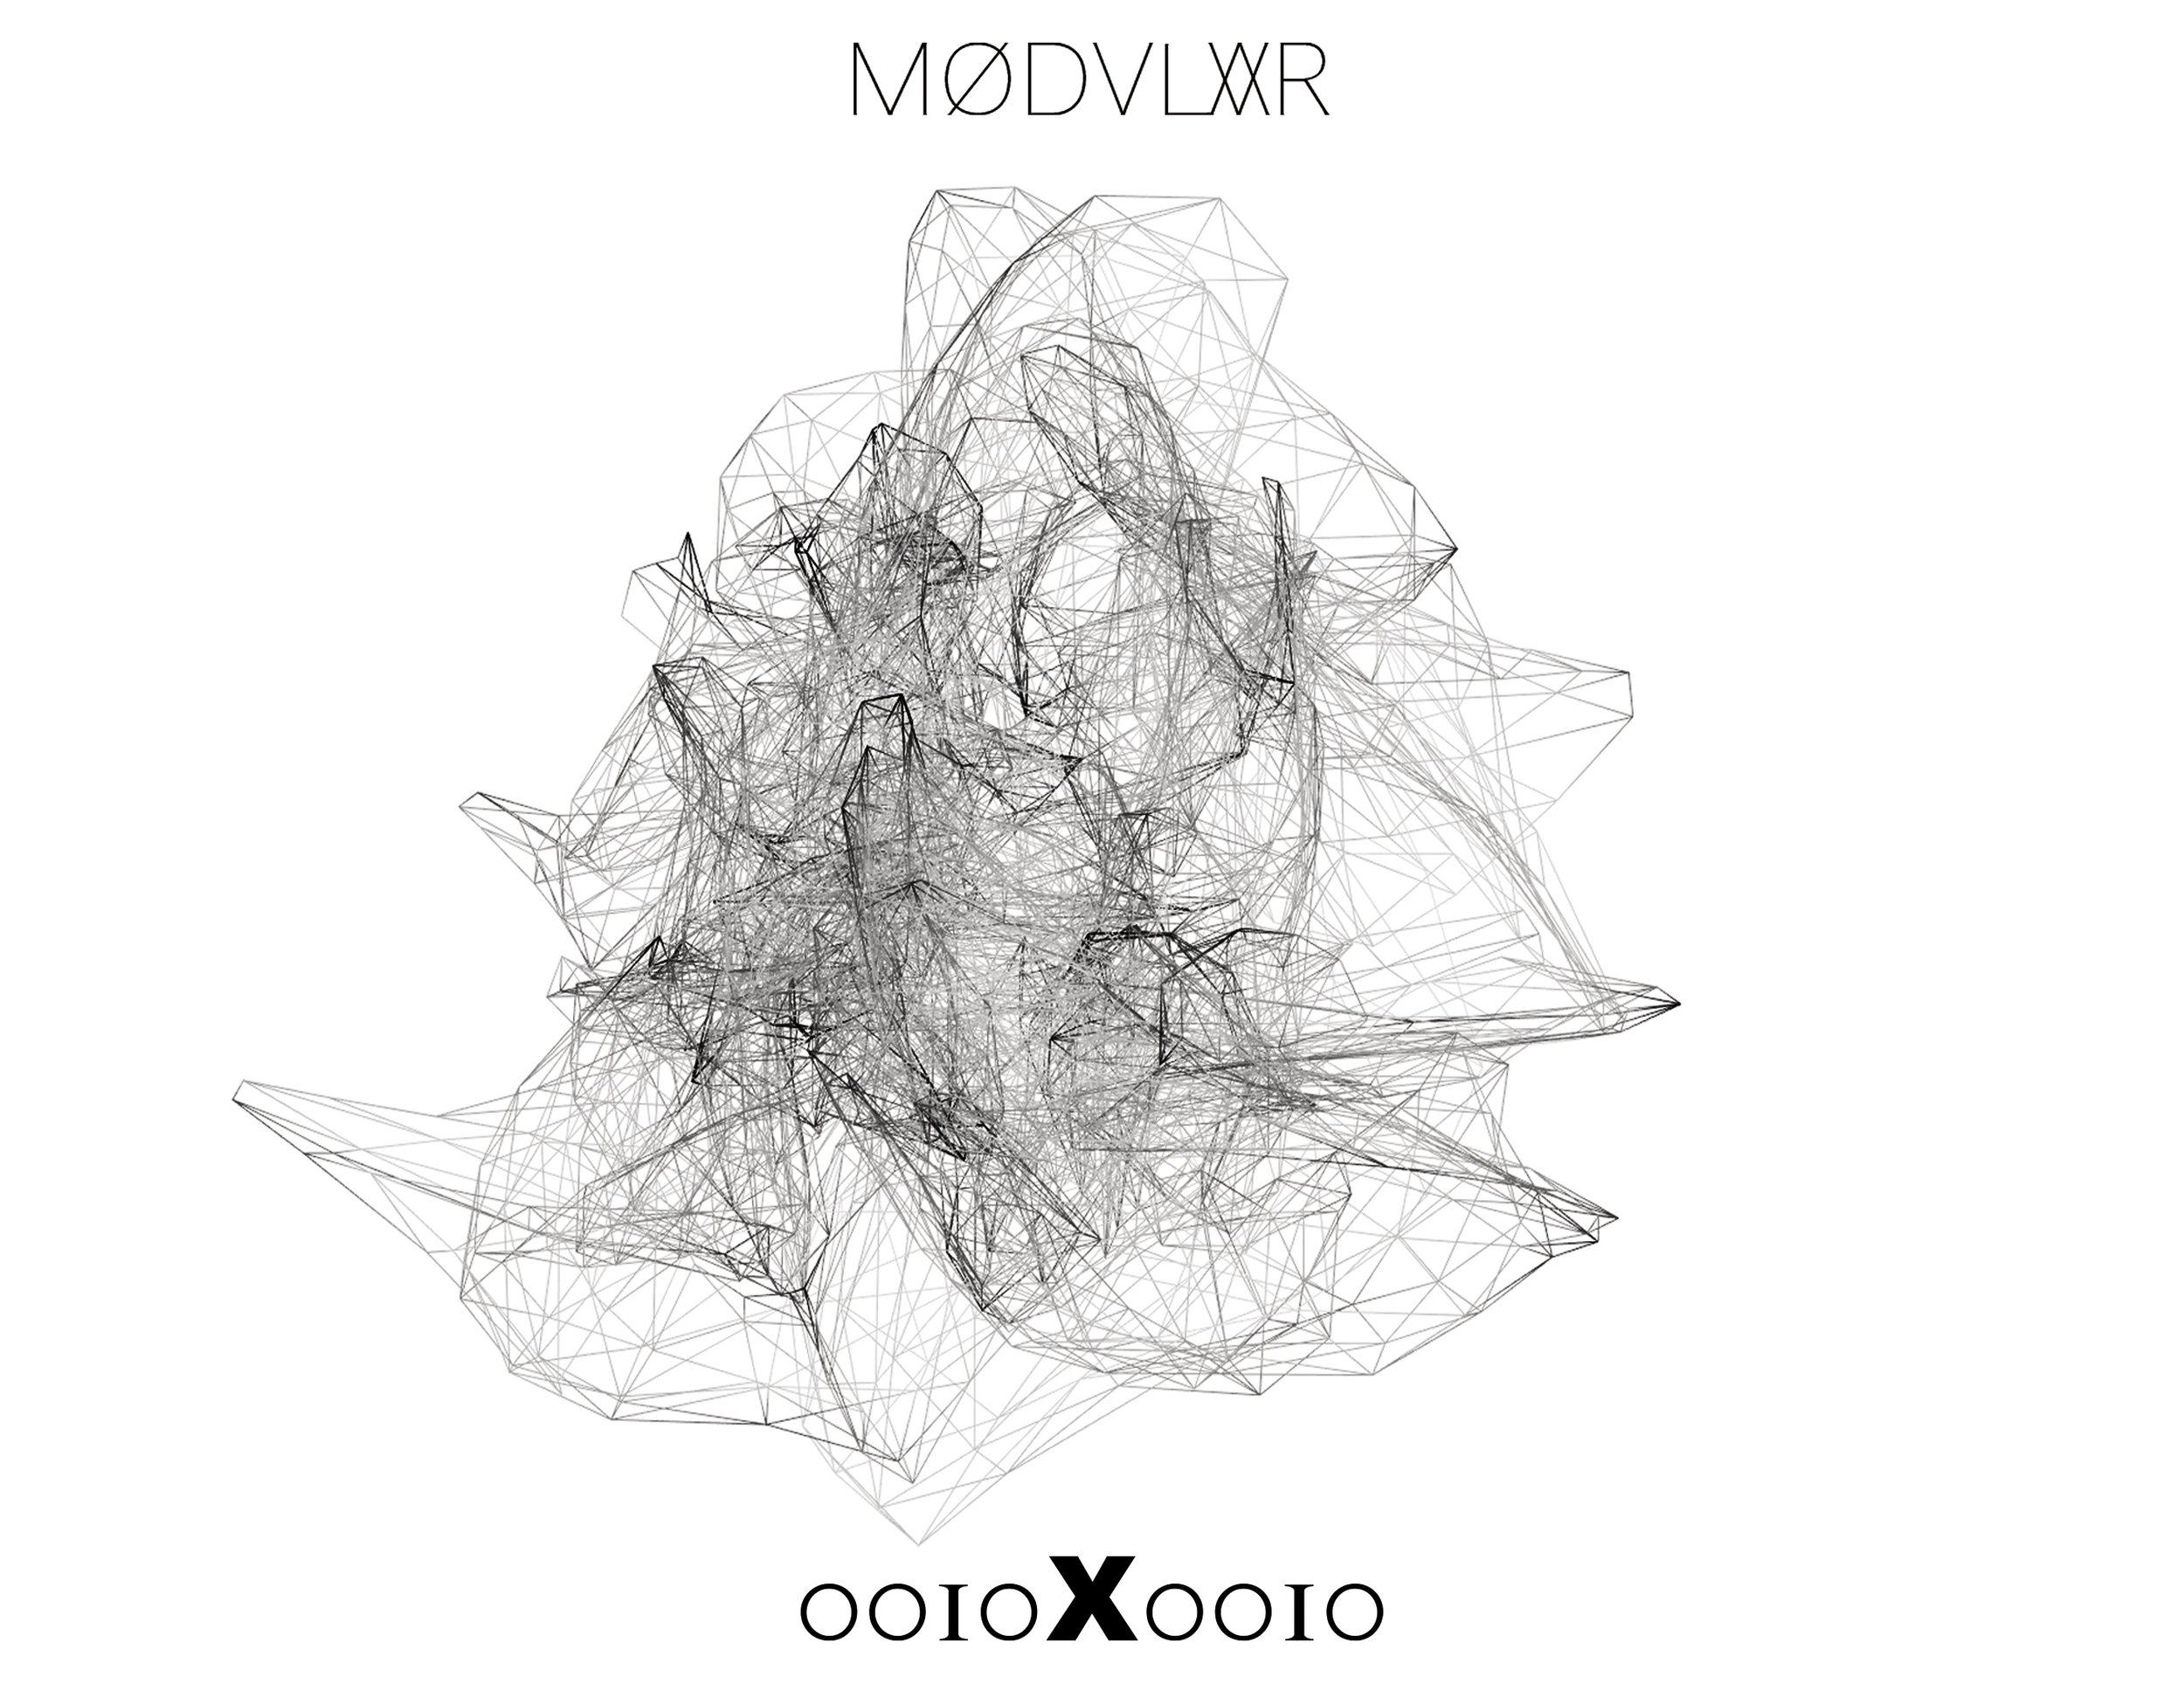 Artist: 0010×0010 Title: MØDVLXXR Label: Modular Freq  Genre: Techno  Modular Freq is happy to announce the release of 'MØDVLXXR'. A new 100% modular performed album by multimedia artist  0010×0010 .